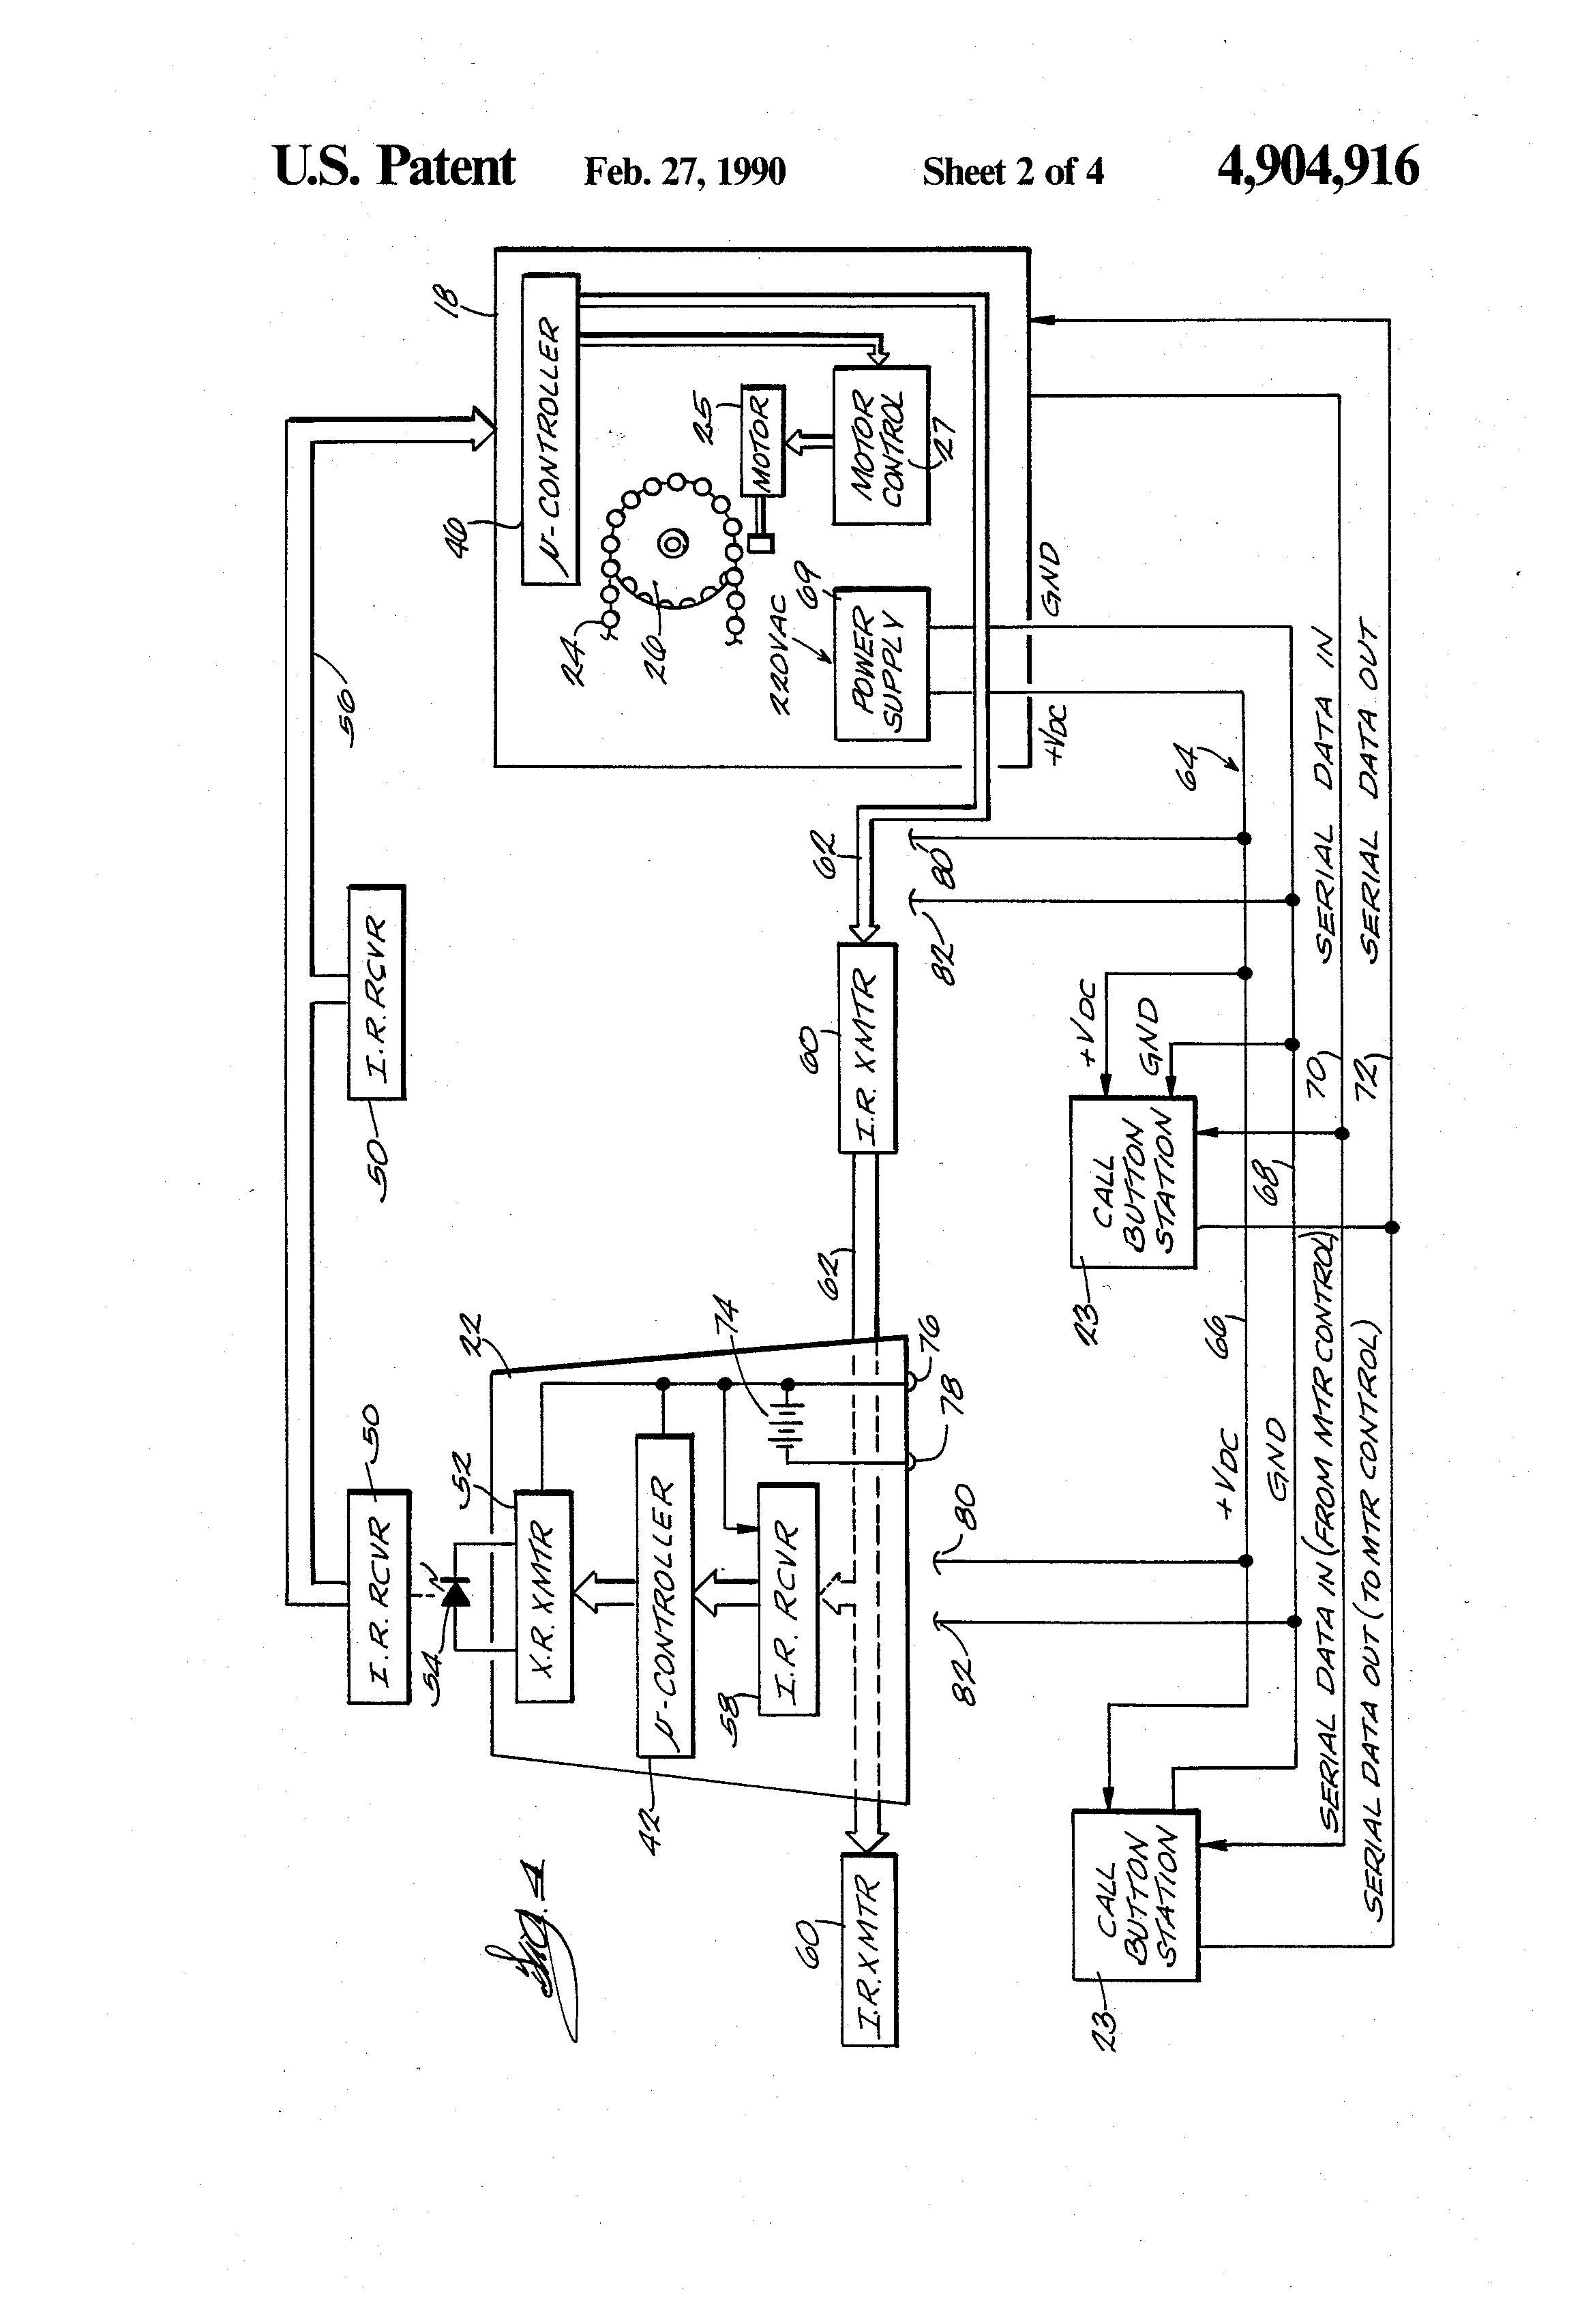 Excel Stair Lift Wiring Diagram